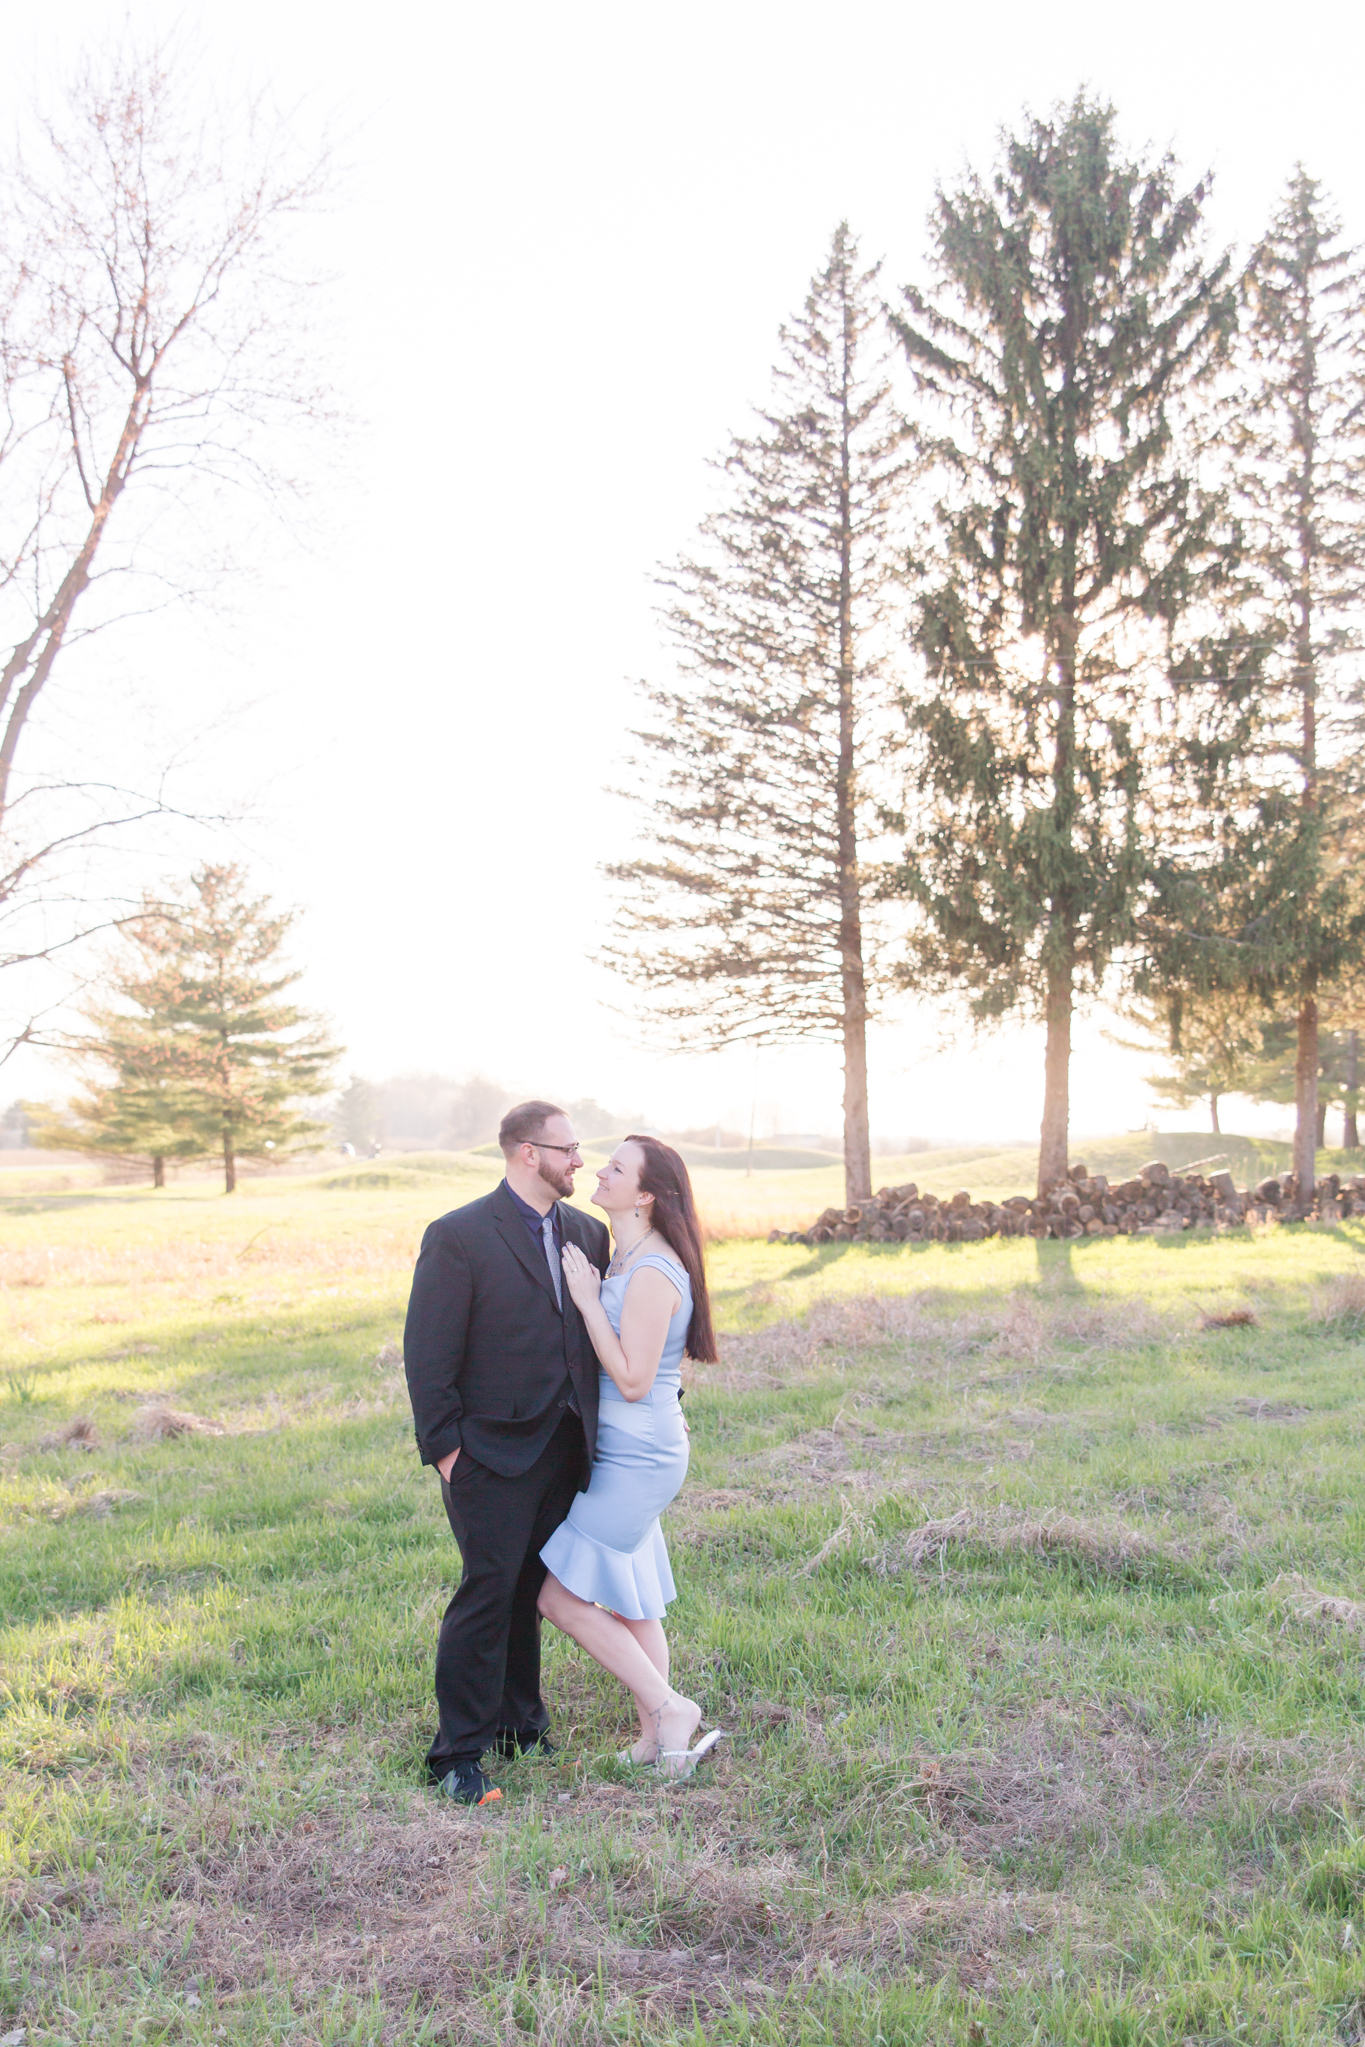 Erin & Max – Surprise Proposal & Engagement Photos – 4.24.19